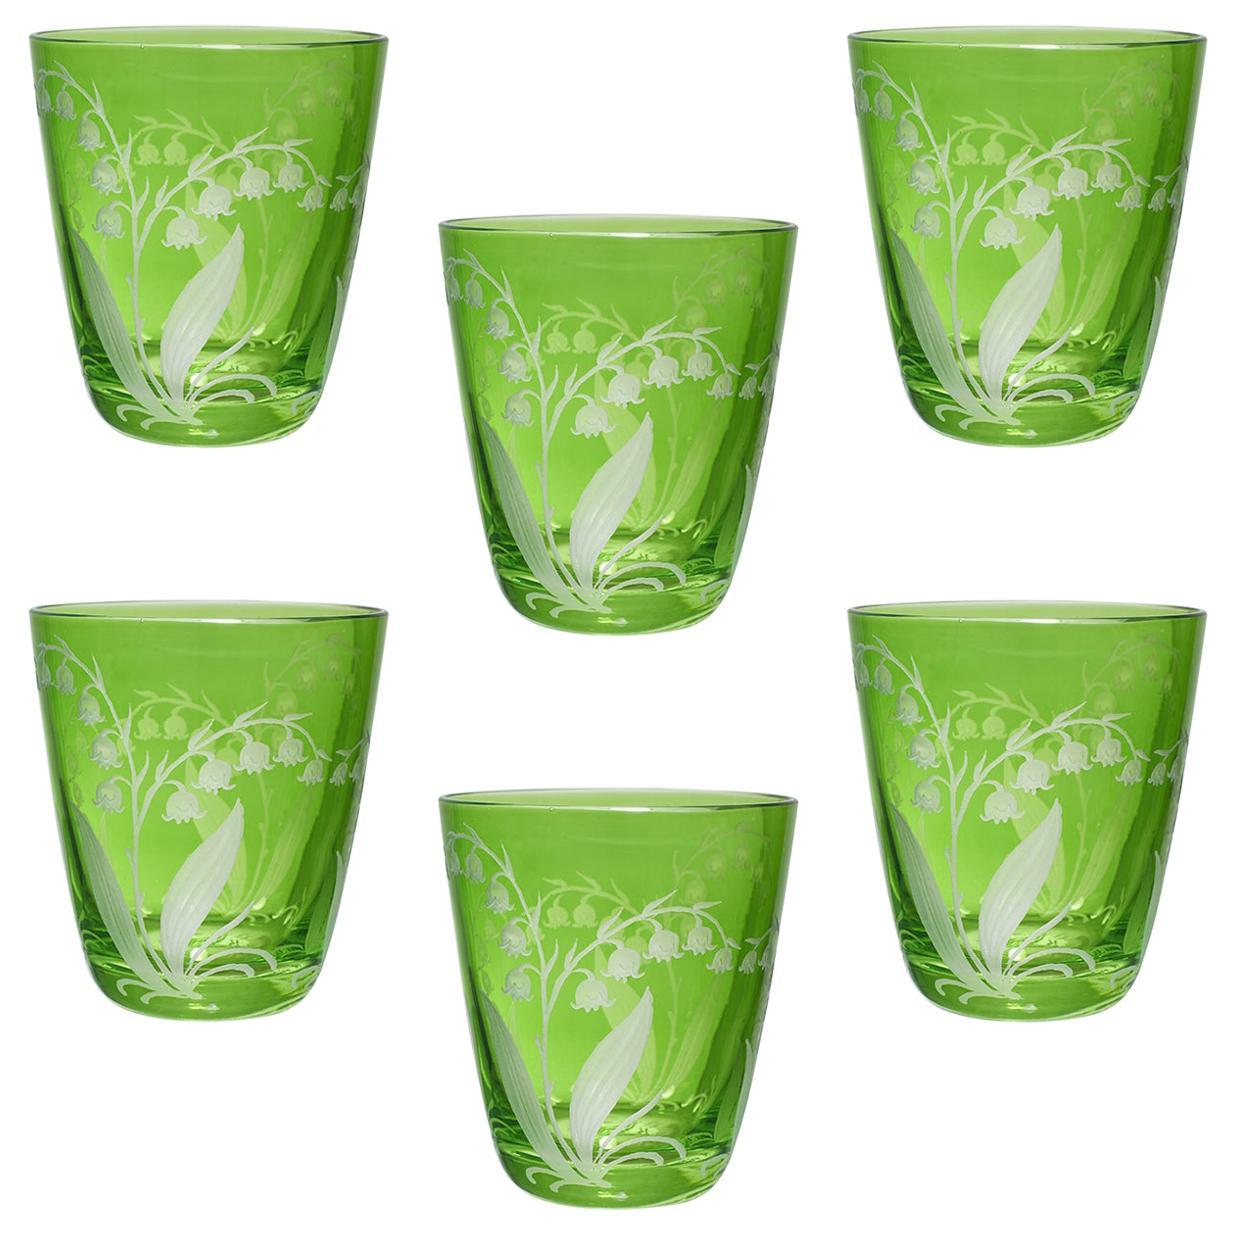 Country Style Set of Six Glass Tumbler Green Sofina Boutique Kitzbuehel